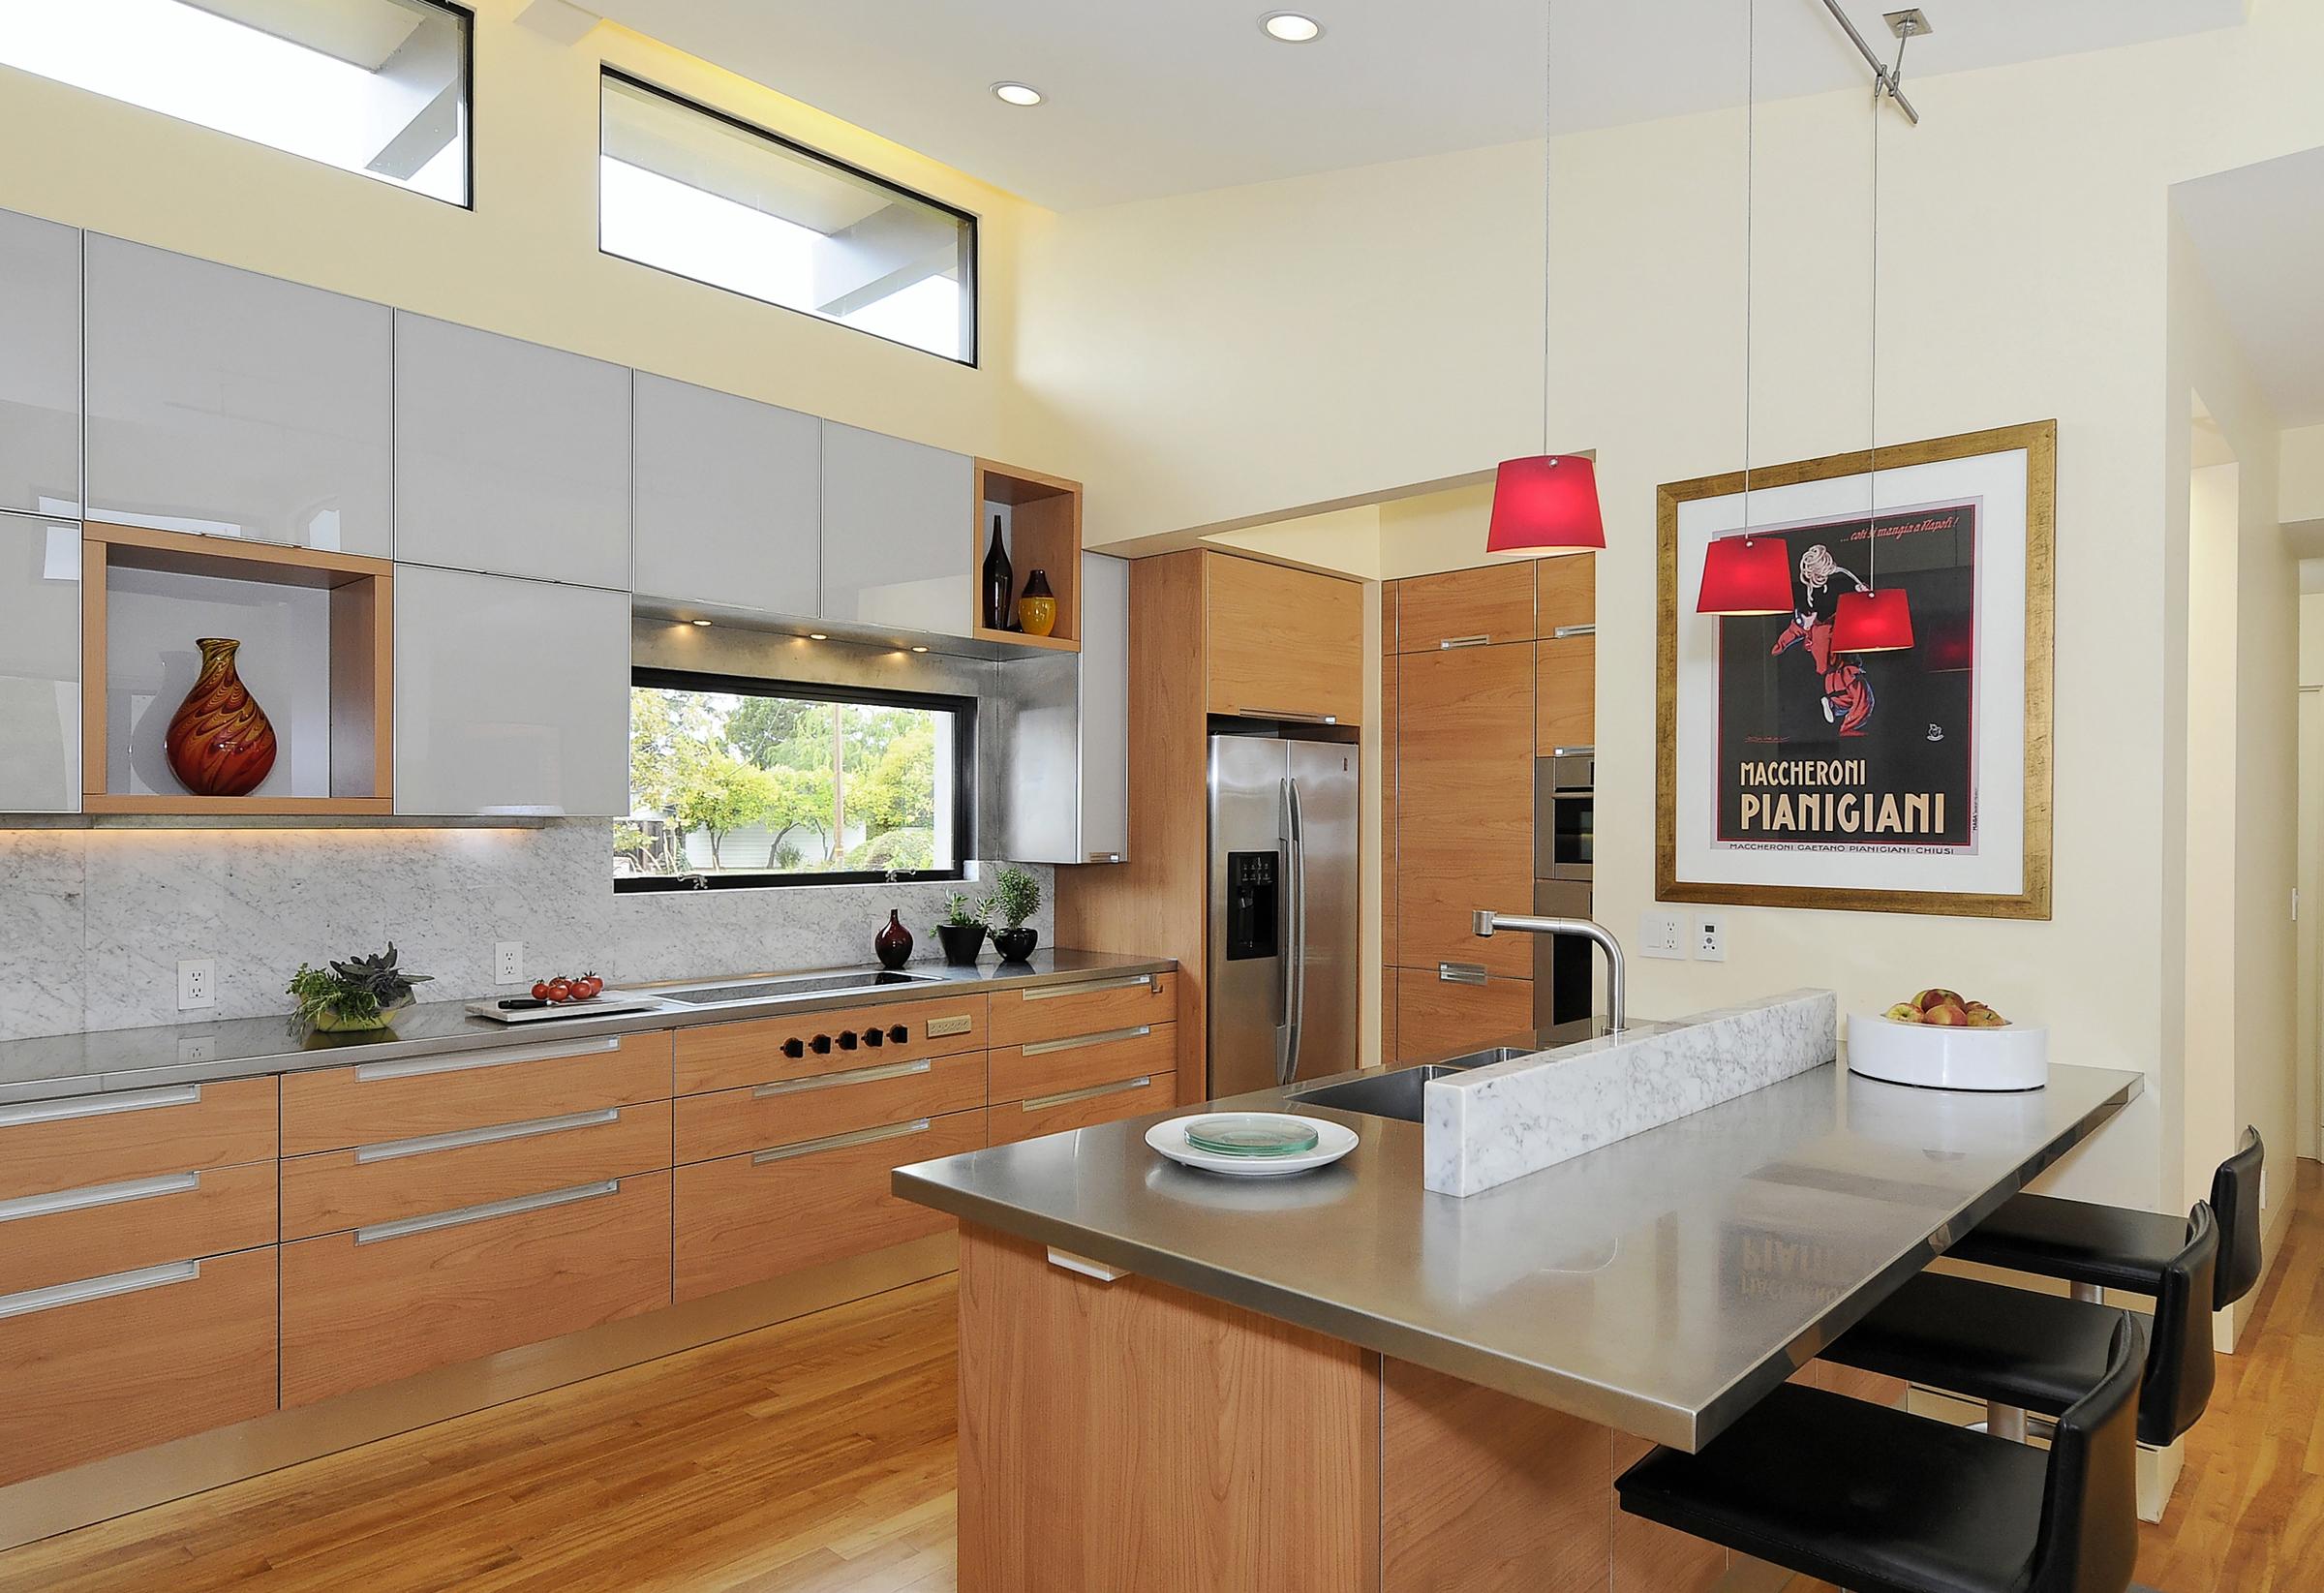 5 315 Alicia Kitchen.jpg